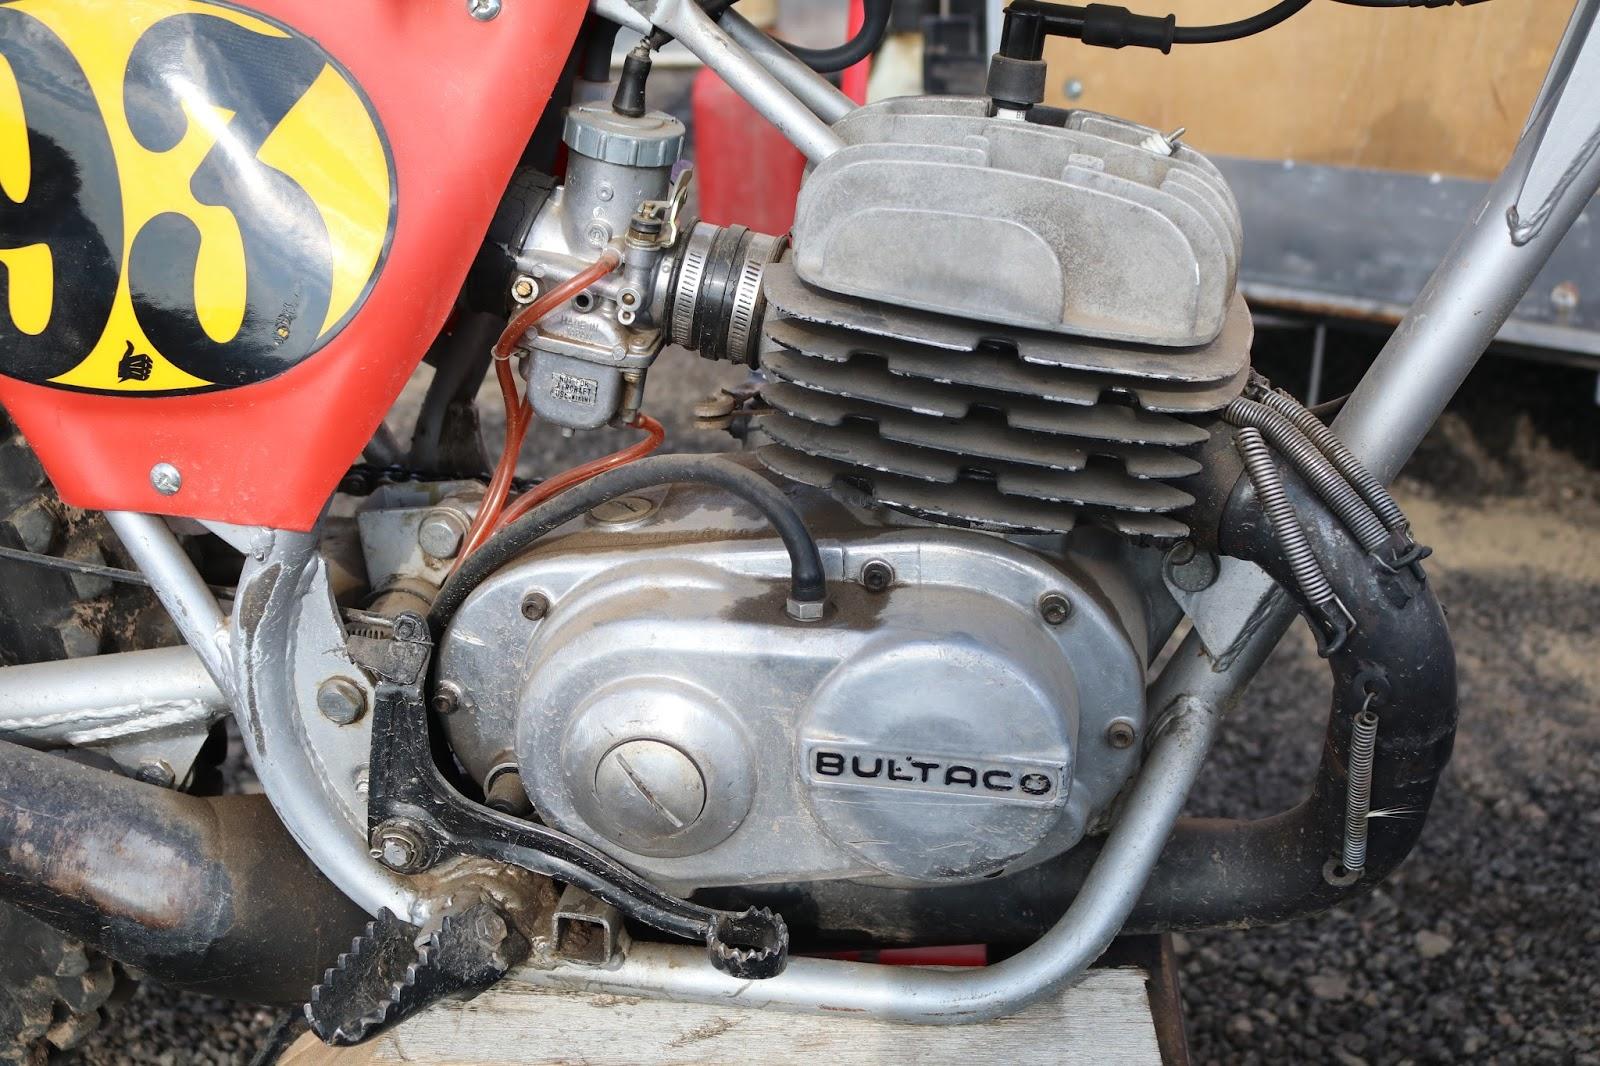 Oldmotodude Bultaco Pursang 93 At The Rocky Mountain